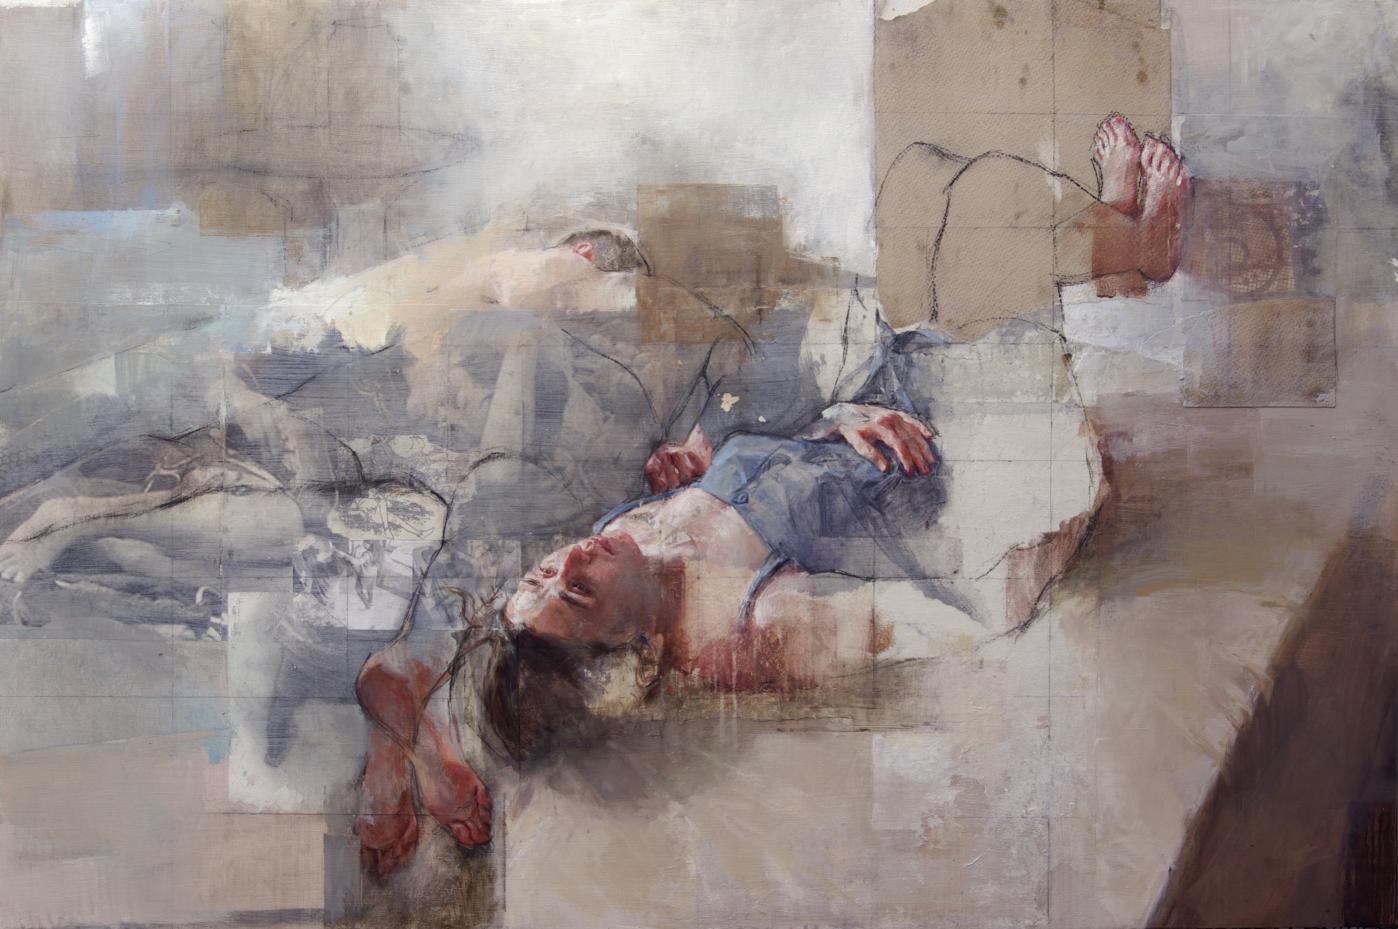 El cuento (2015) - Pilar López Báez